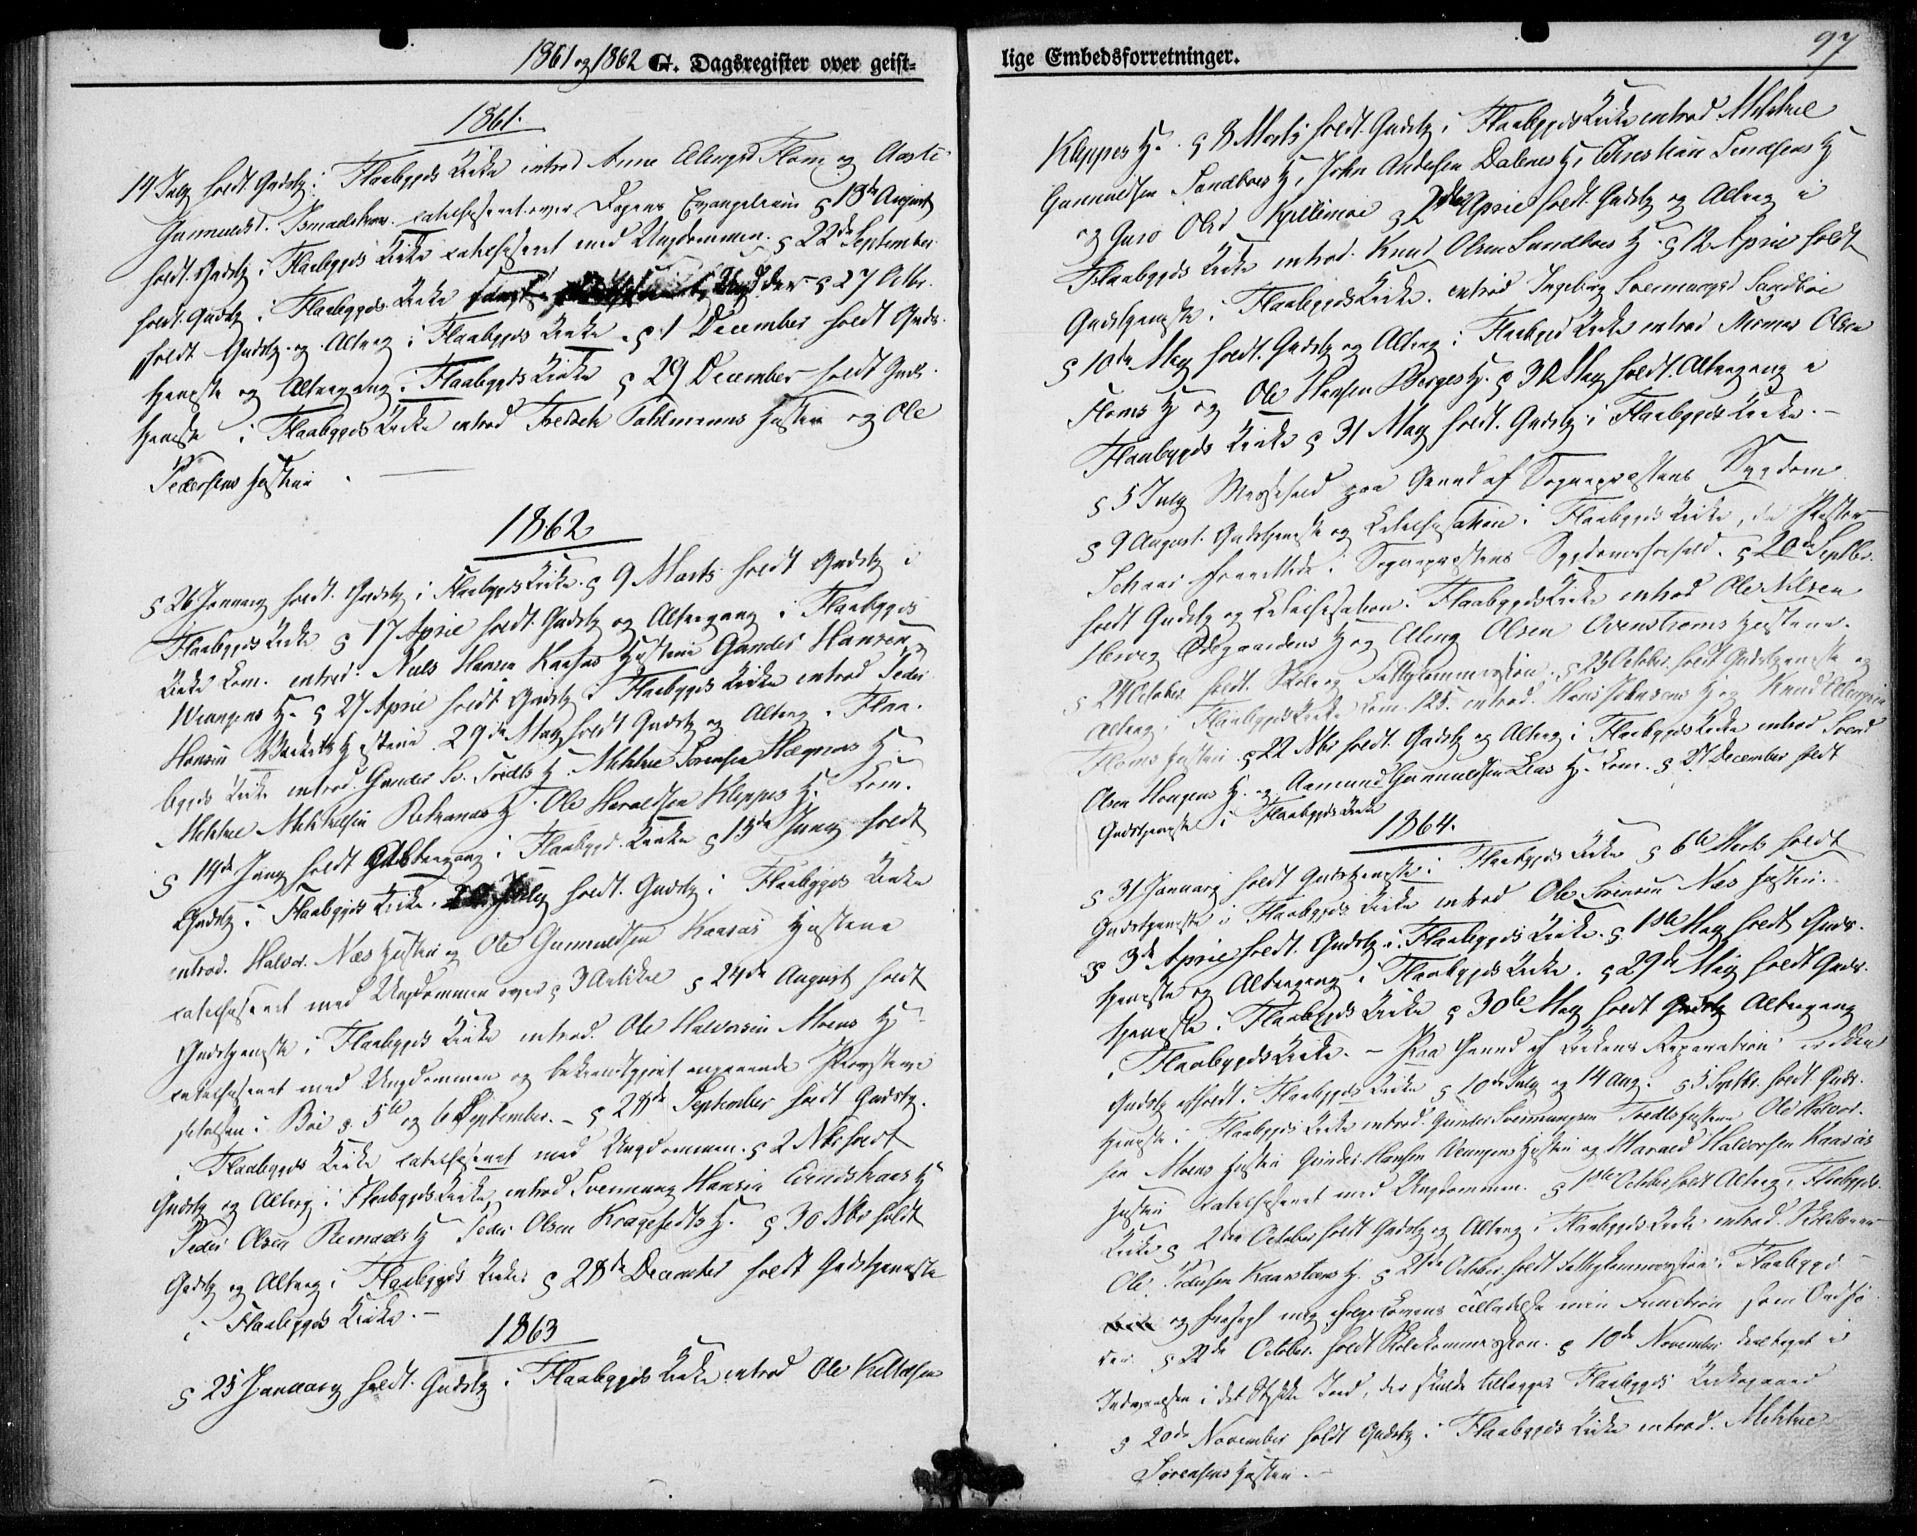 SAKO, Lunde kirkebøker, F/Fb/L0002: Ministerialbok nr. II 2, 1861-1881, s. 97